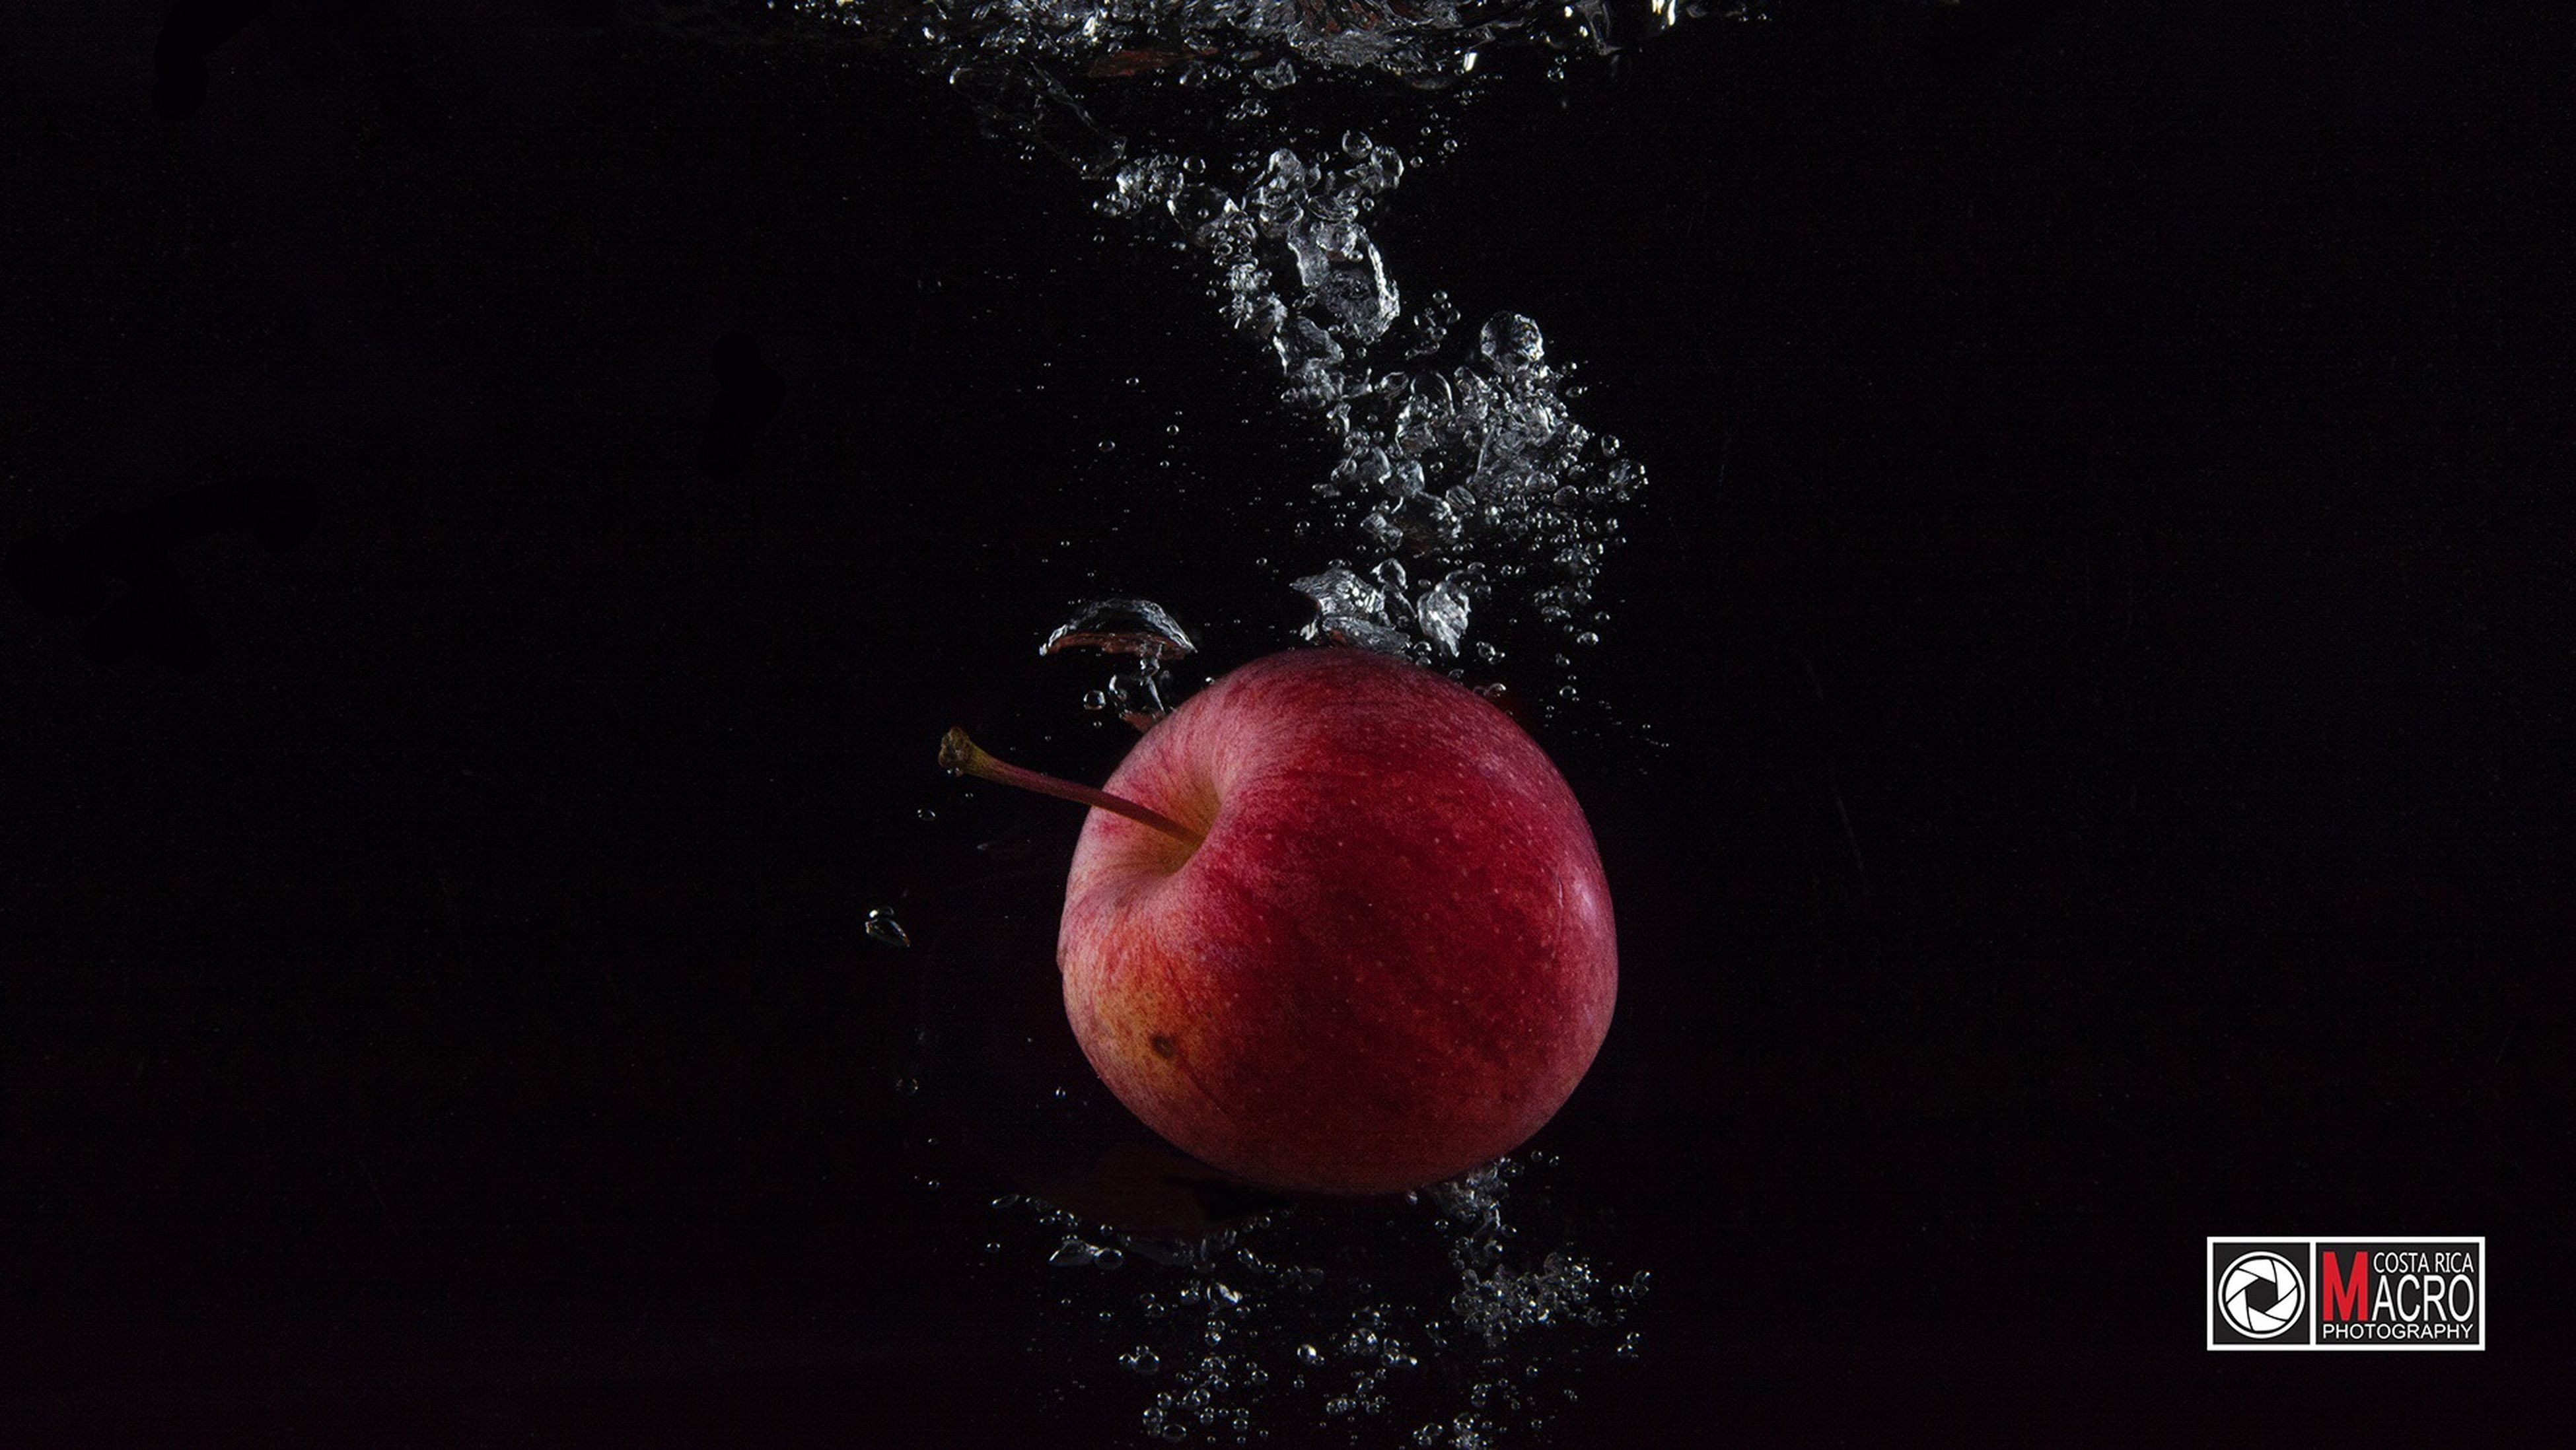 fruit, healthy eating, red, splashing, studio shot, motion, black background, food, impact, close-up, no people, hitting, freshness, day